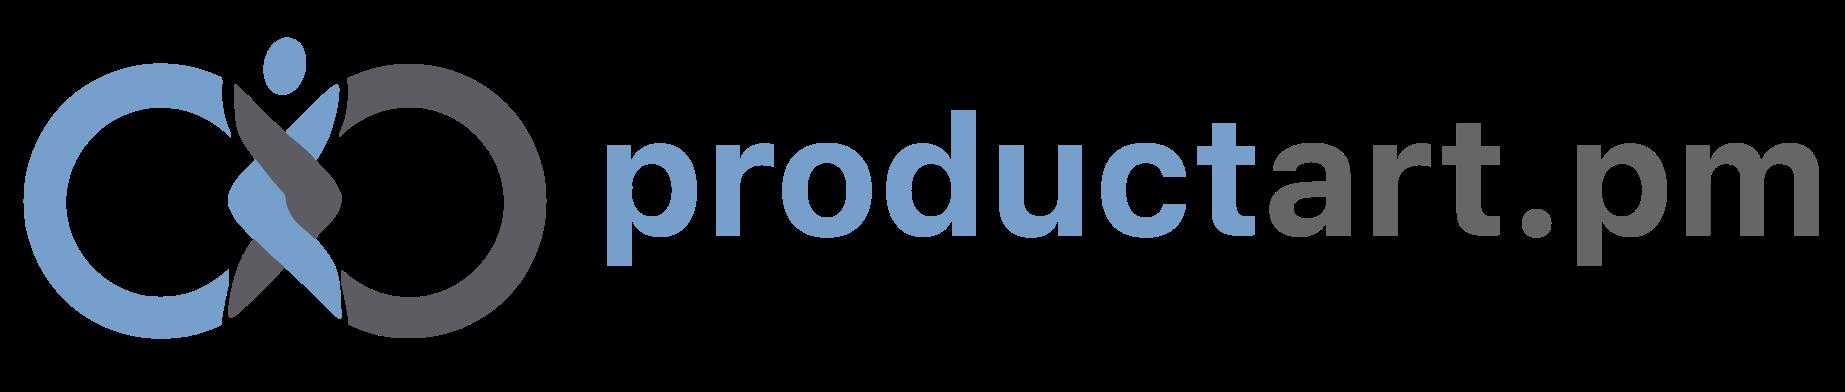 Product Jobs Hub